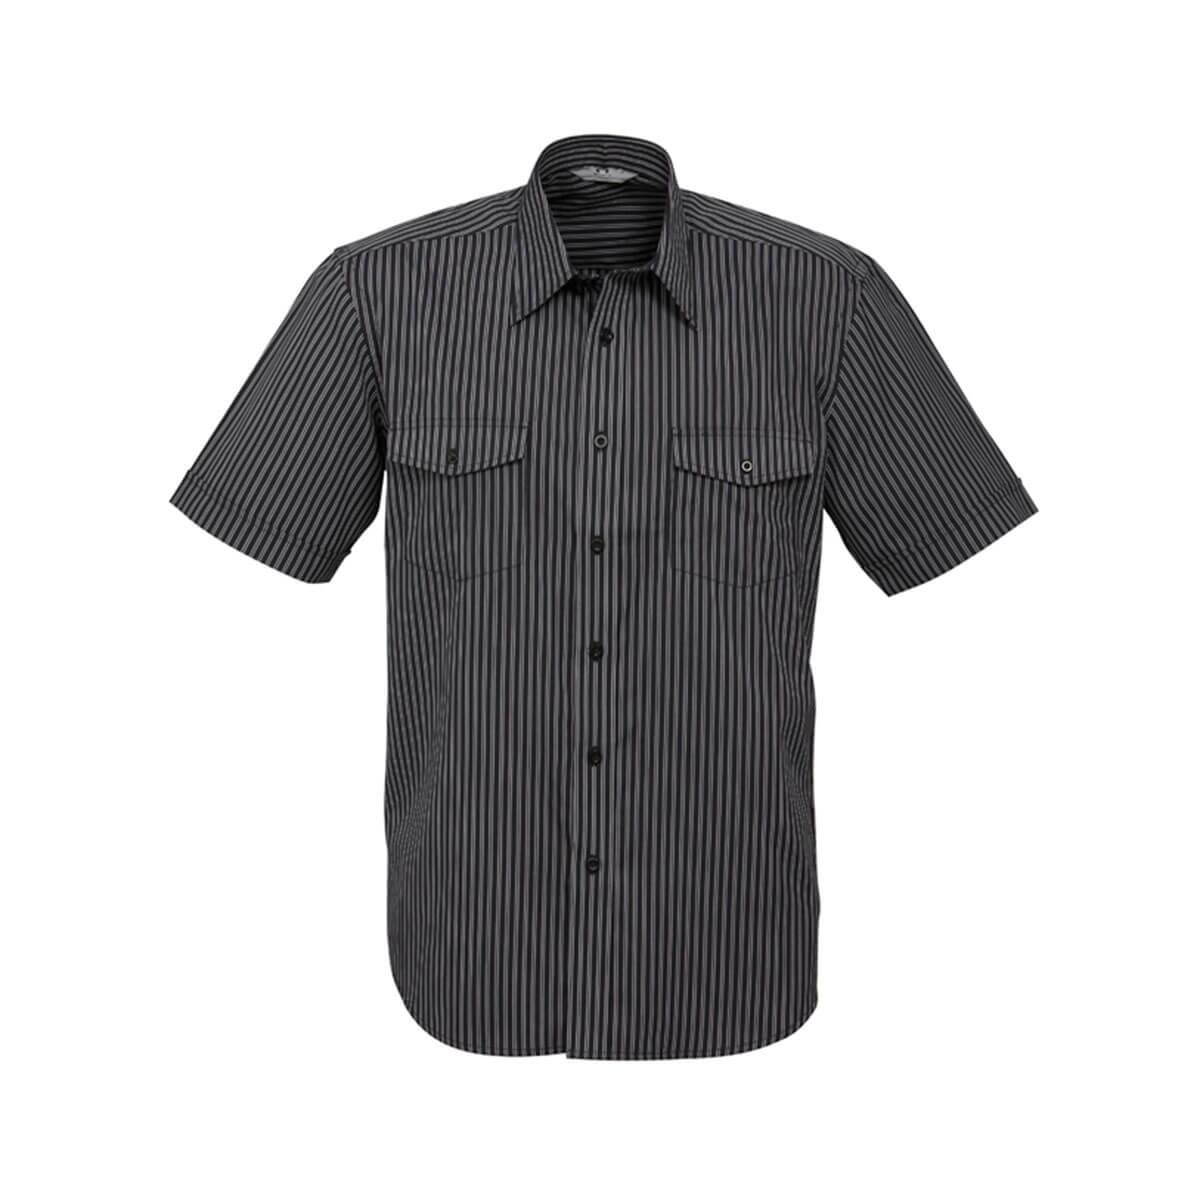 Mens Cuban Short Sleeve Shirt-Black / Silver